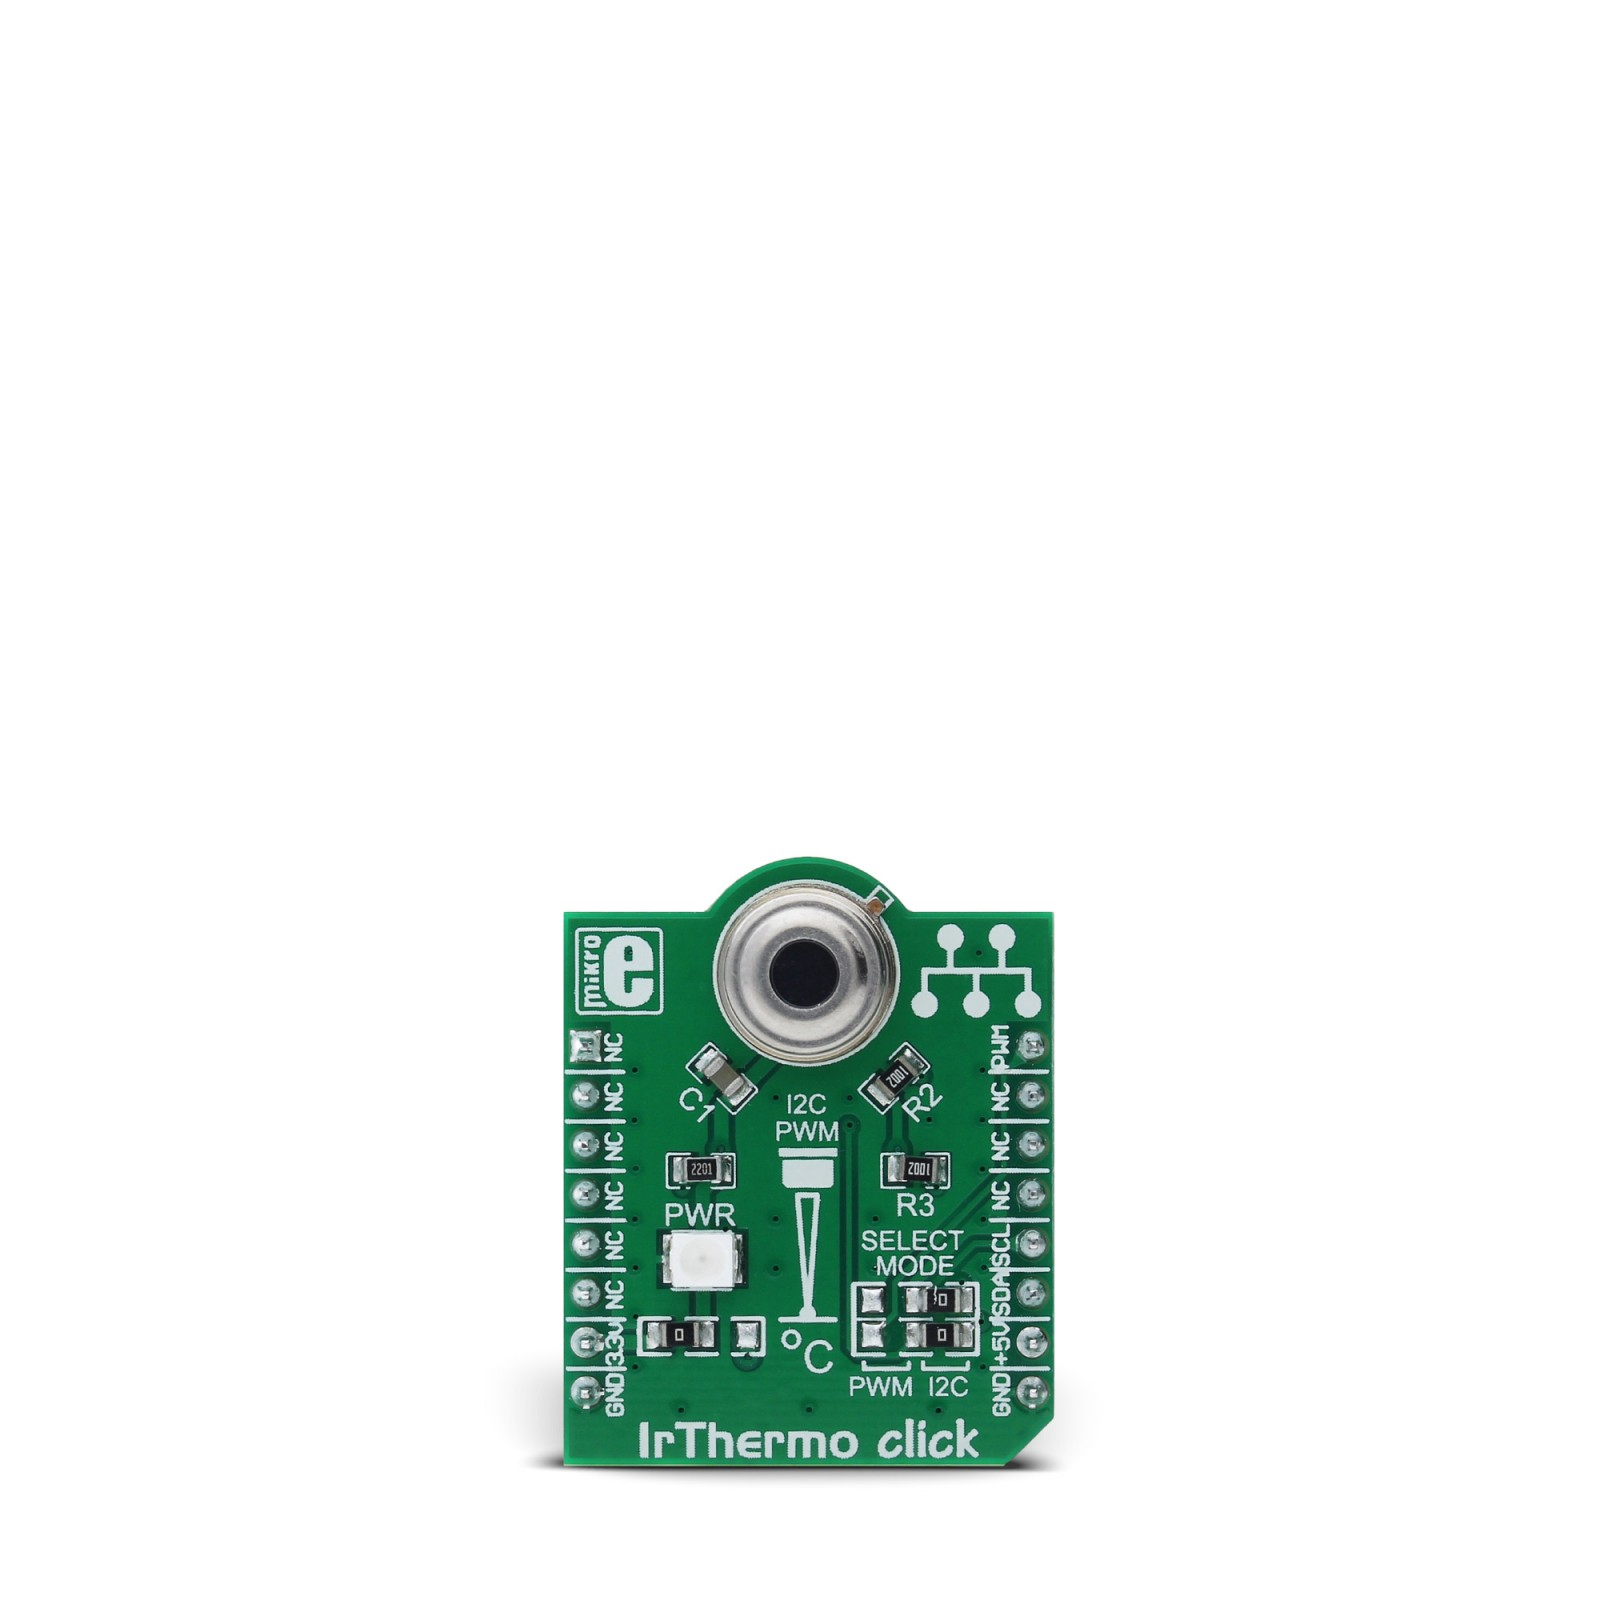 Irthermo Click 33v Board With Mlx90614esf Baa Single Zone Audio Kit Digital Thermometer Pic16f84 Circuit Mgctlbxnmzp Mgctlbxv5112 Mgctlbxlc Mgctlbxpprestashop